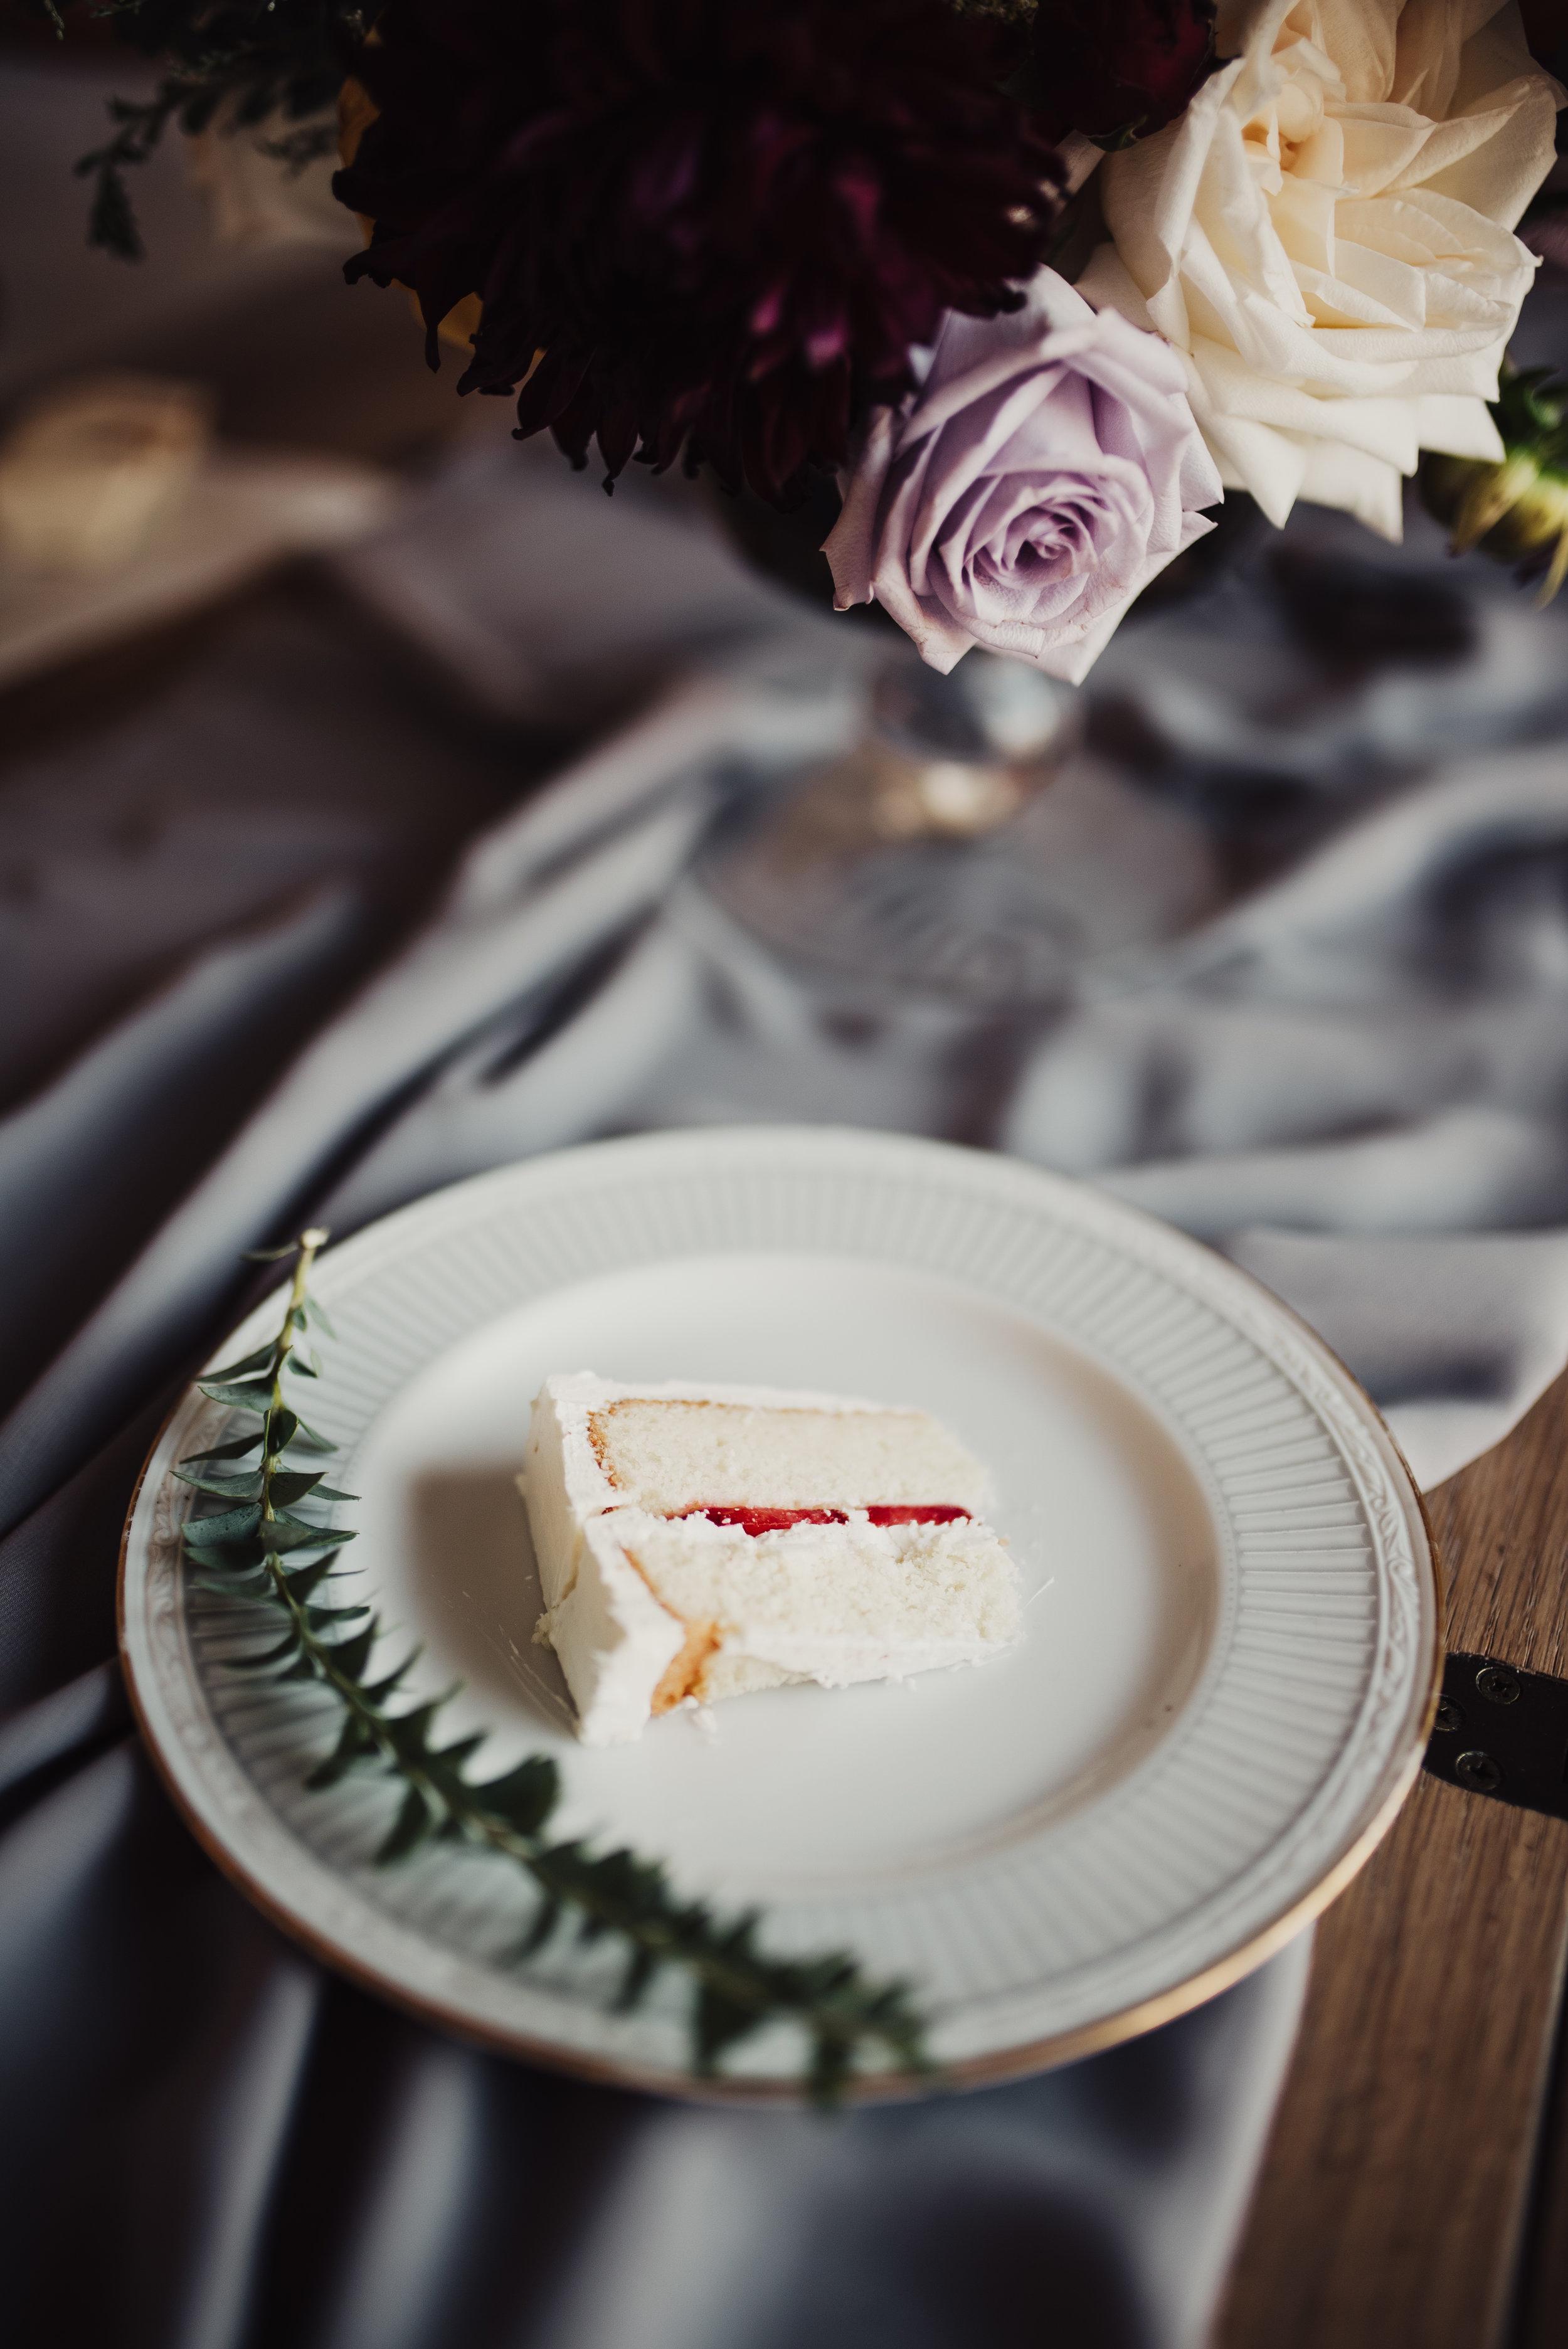 bright-cake-artistry-wedding-cake-slice.jpg